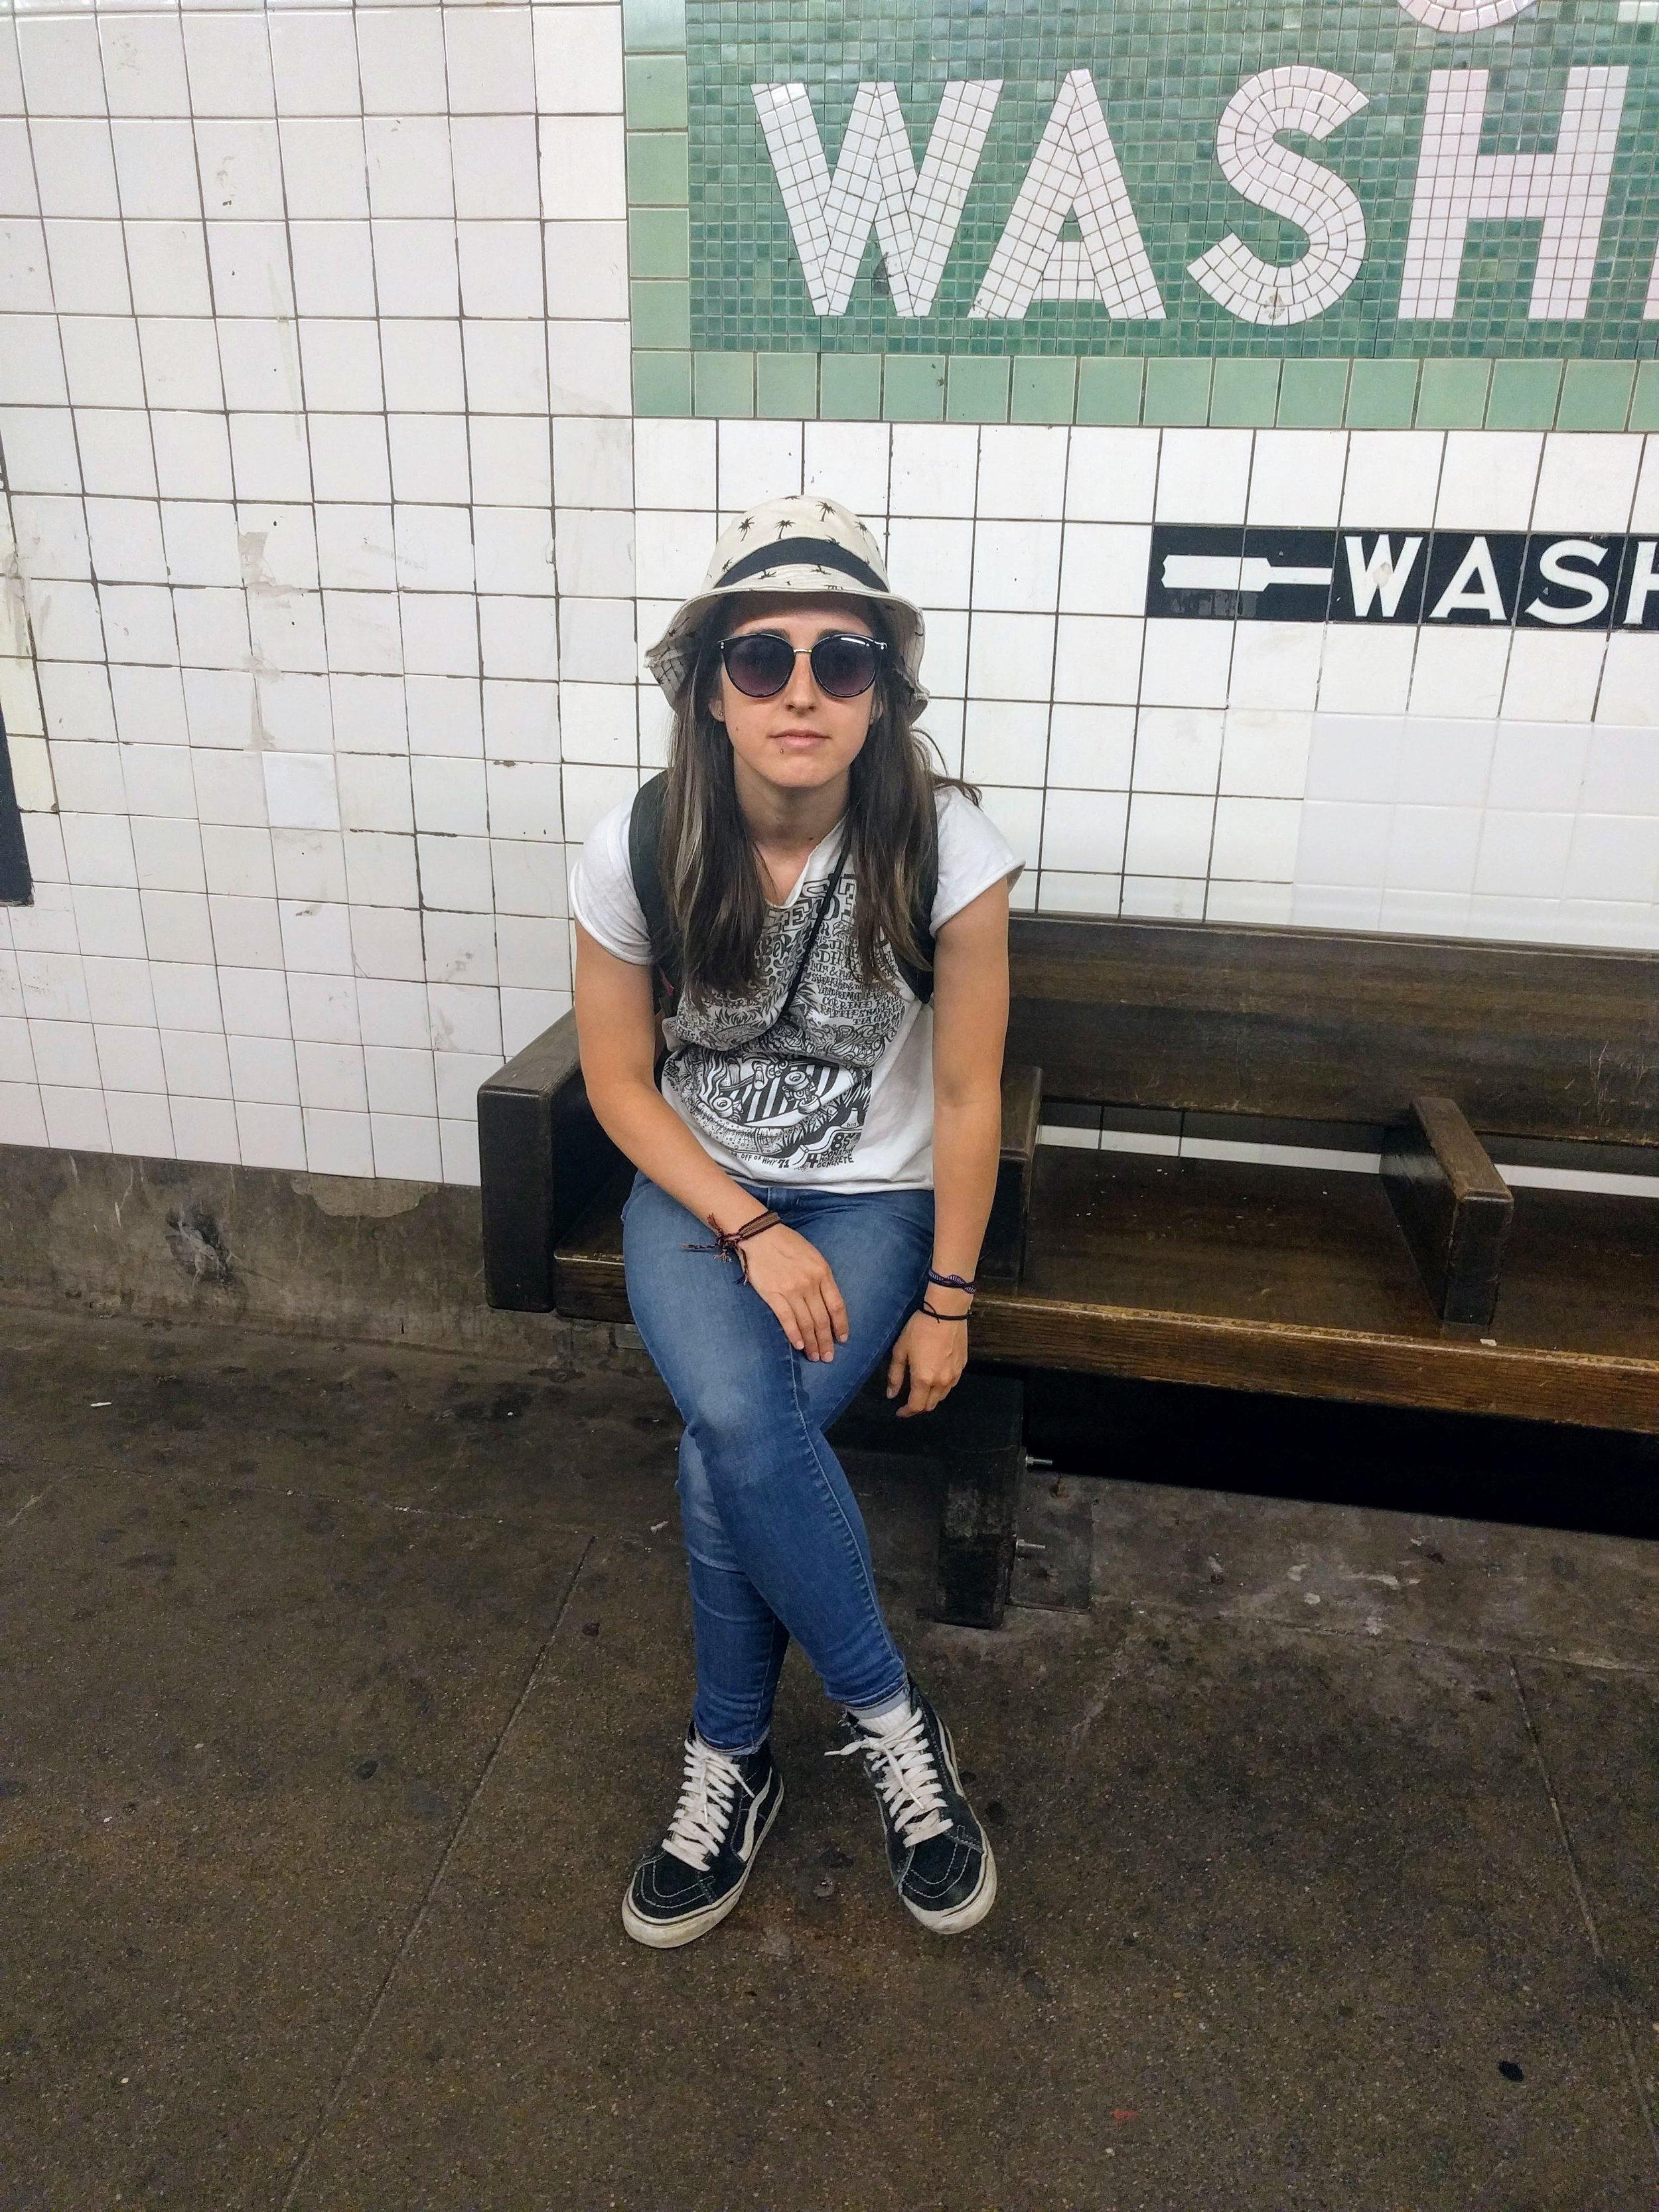 My city subway rat